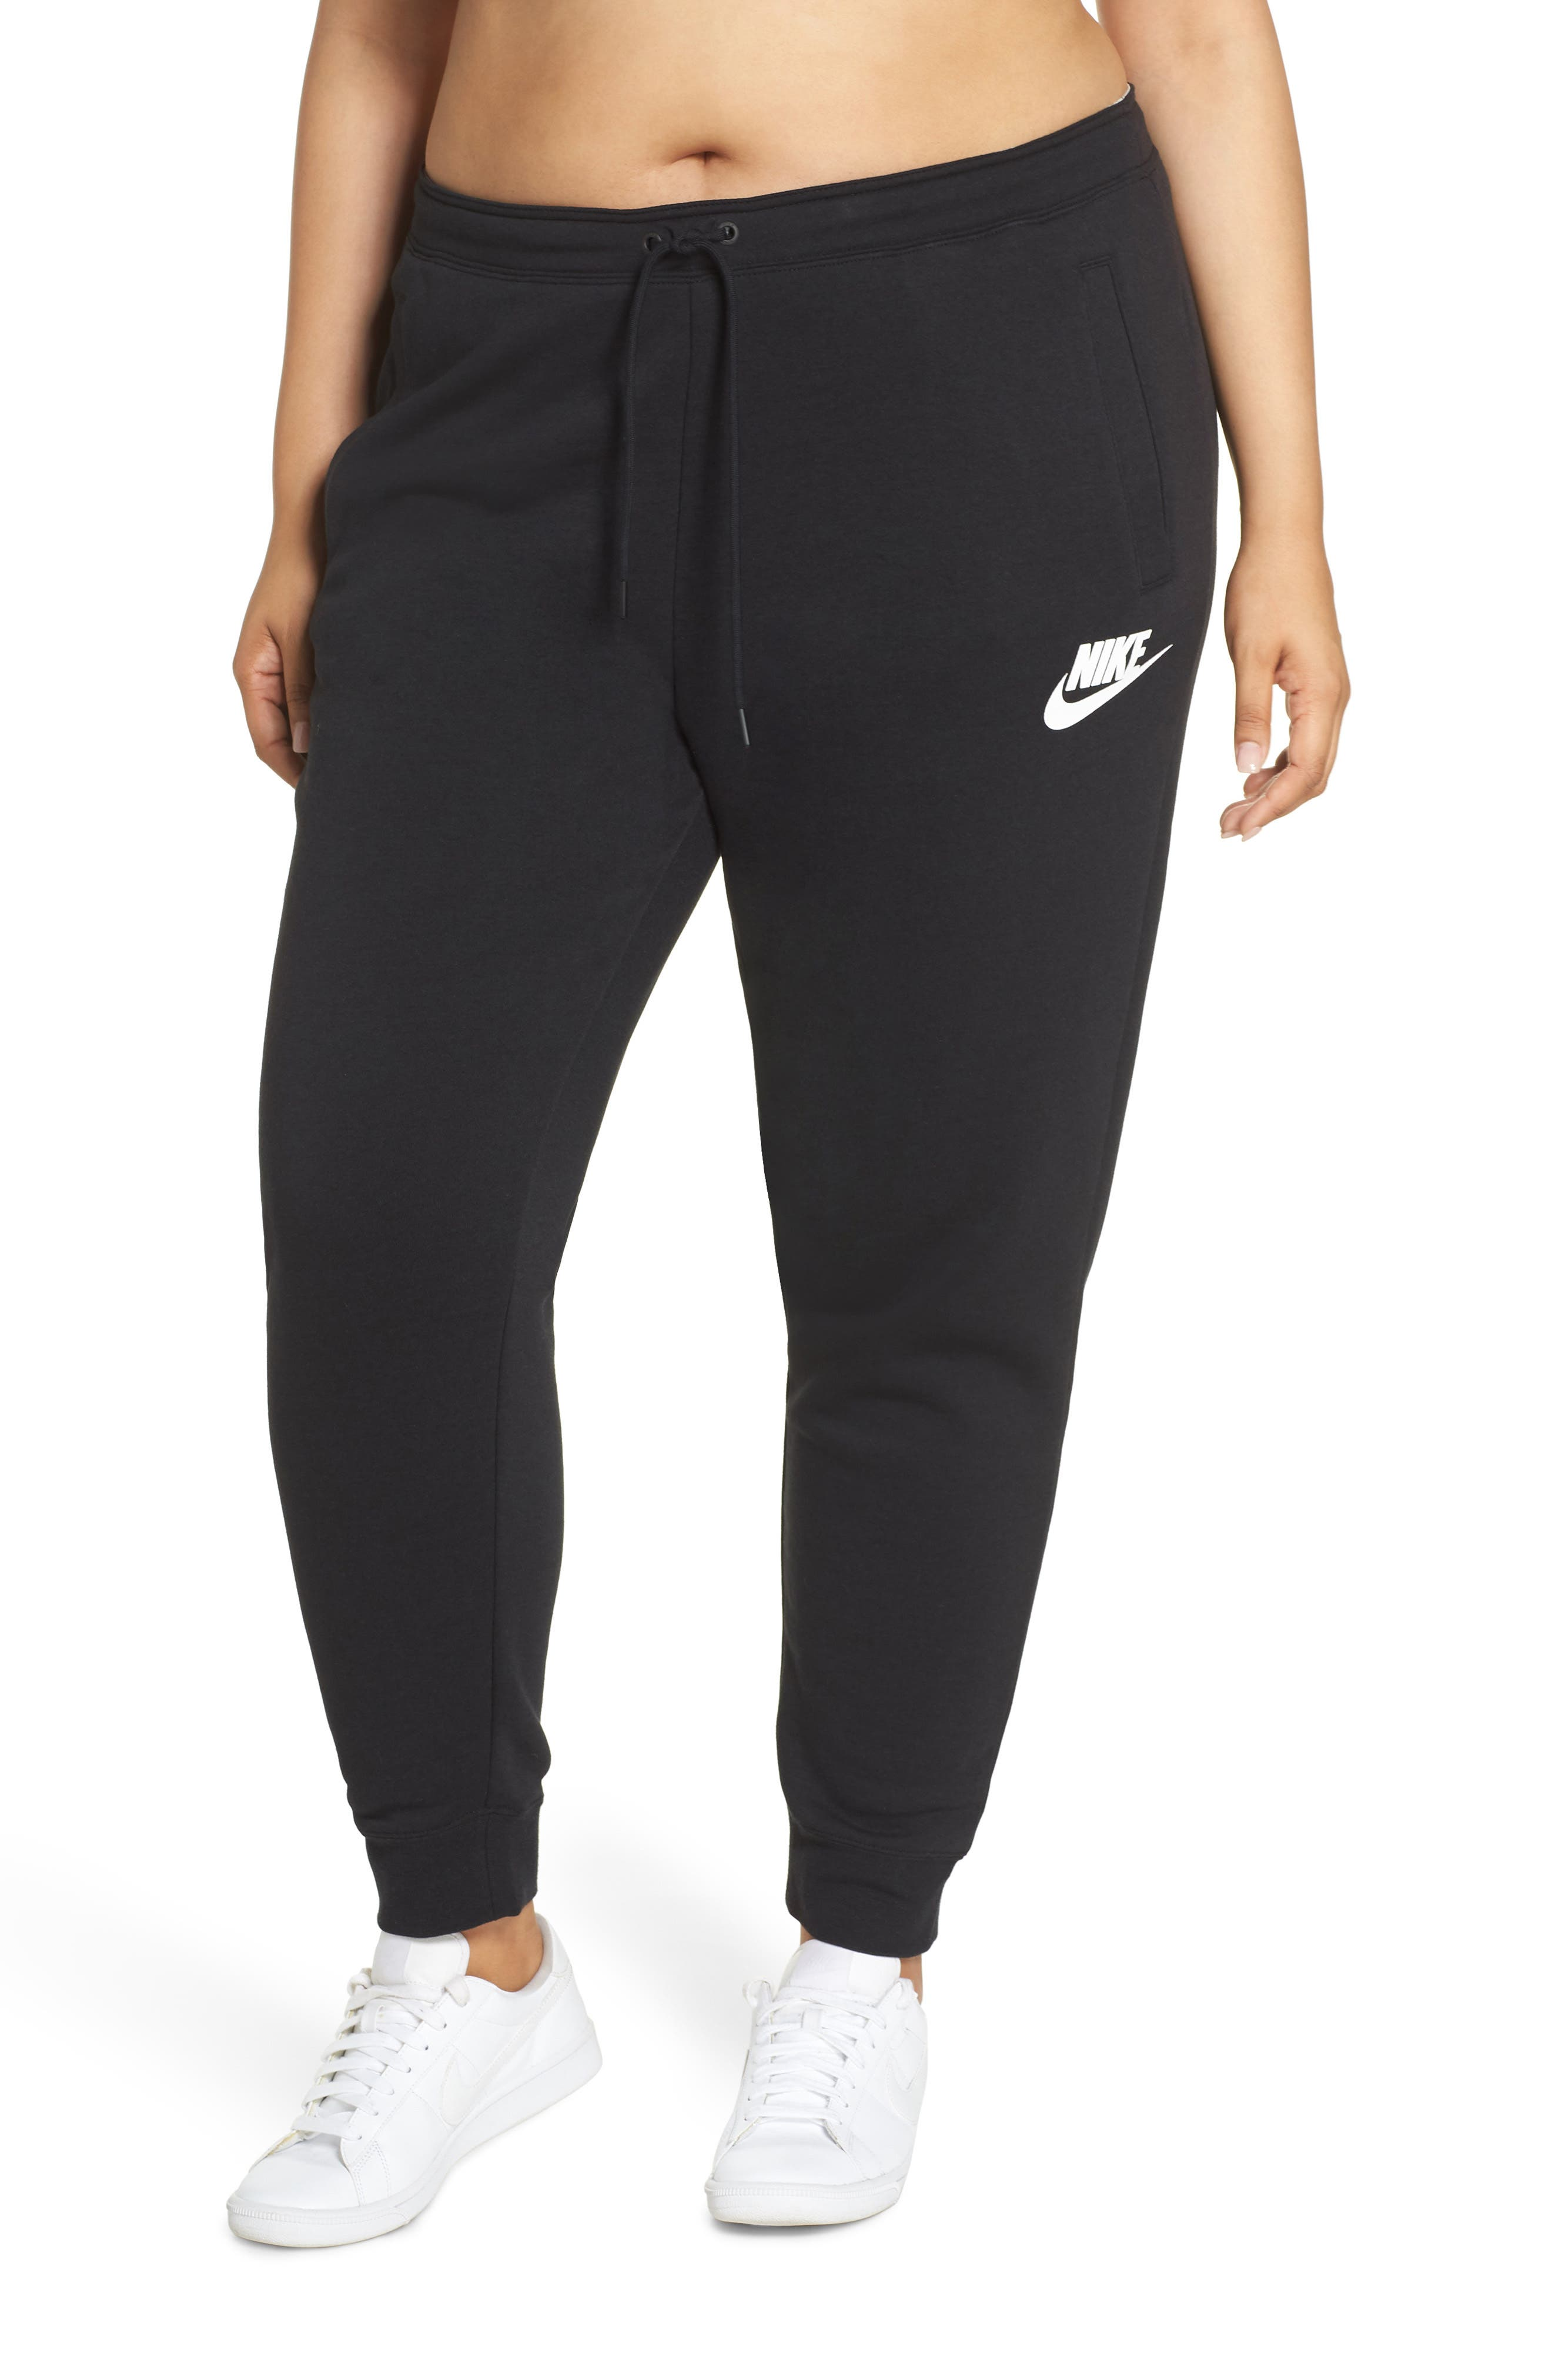 NIKE, Sportswear Rally High Rise Jogger Pants, Main thumbnail 1, color, BLACK/ BLACK/ WHITE